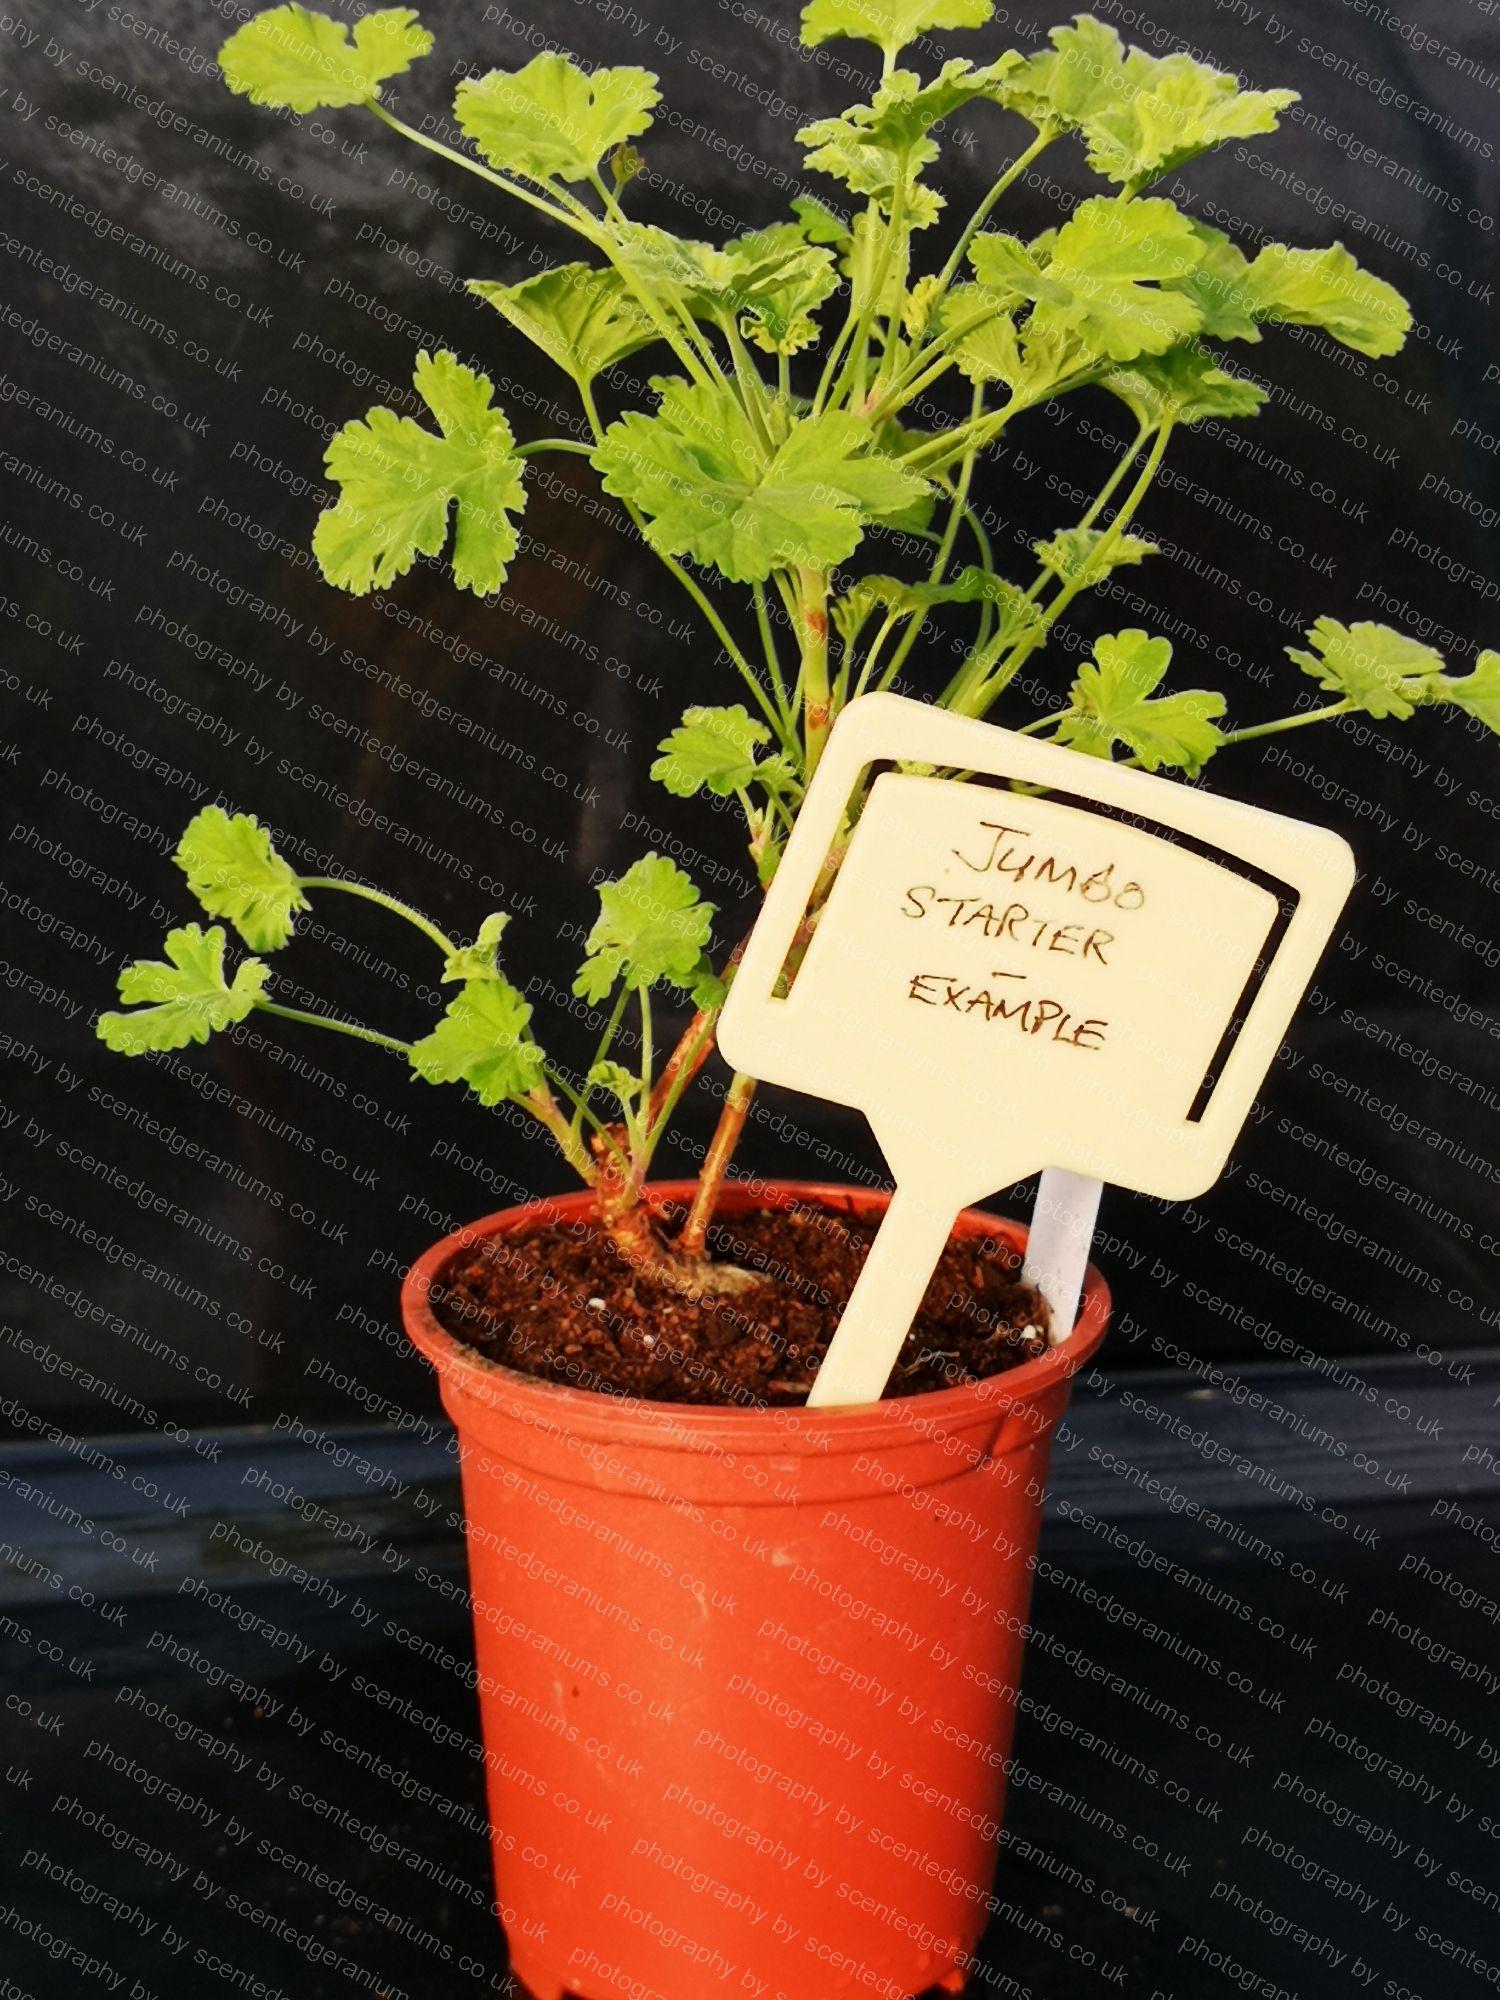 P. creamy nutmeg scentedgeraniums.co.uk